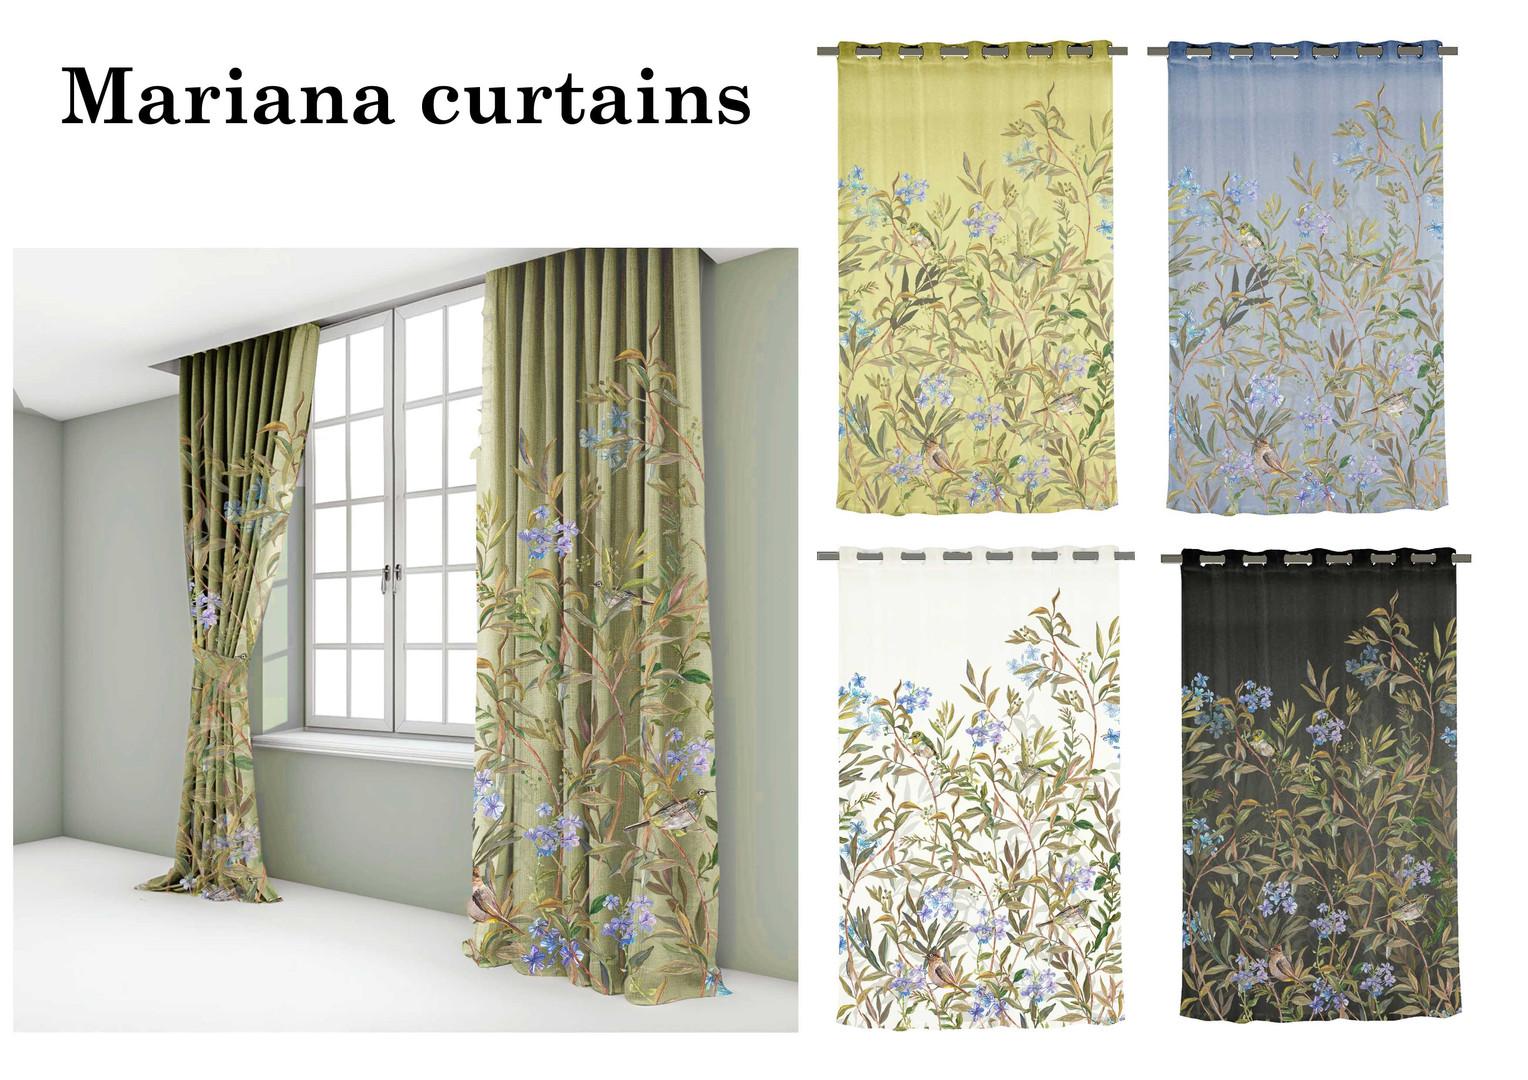 Mariana Wild Curtains copy.jpg